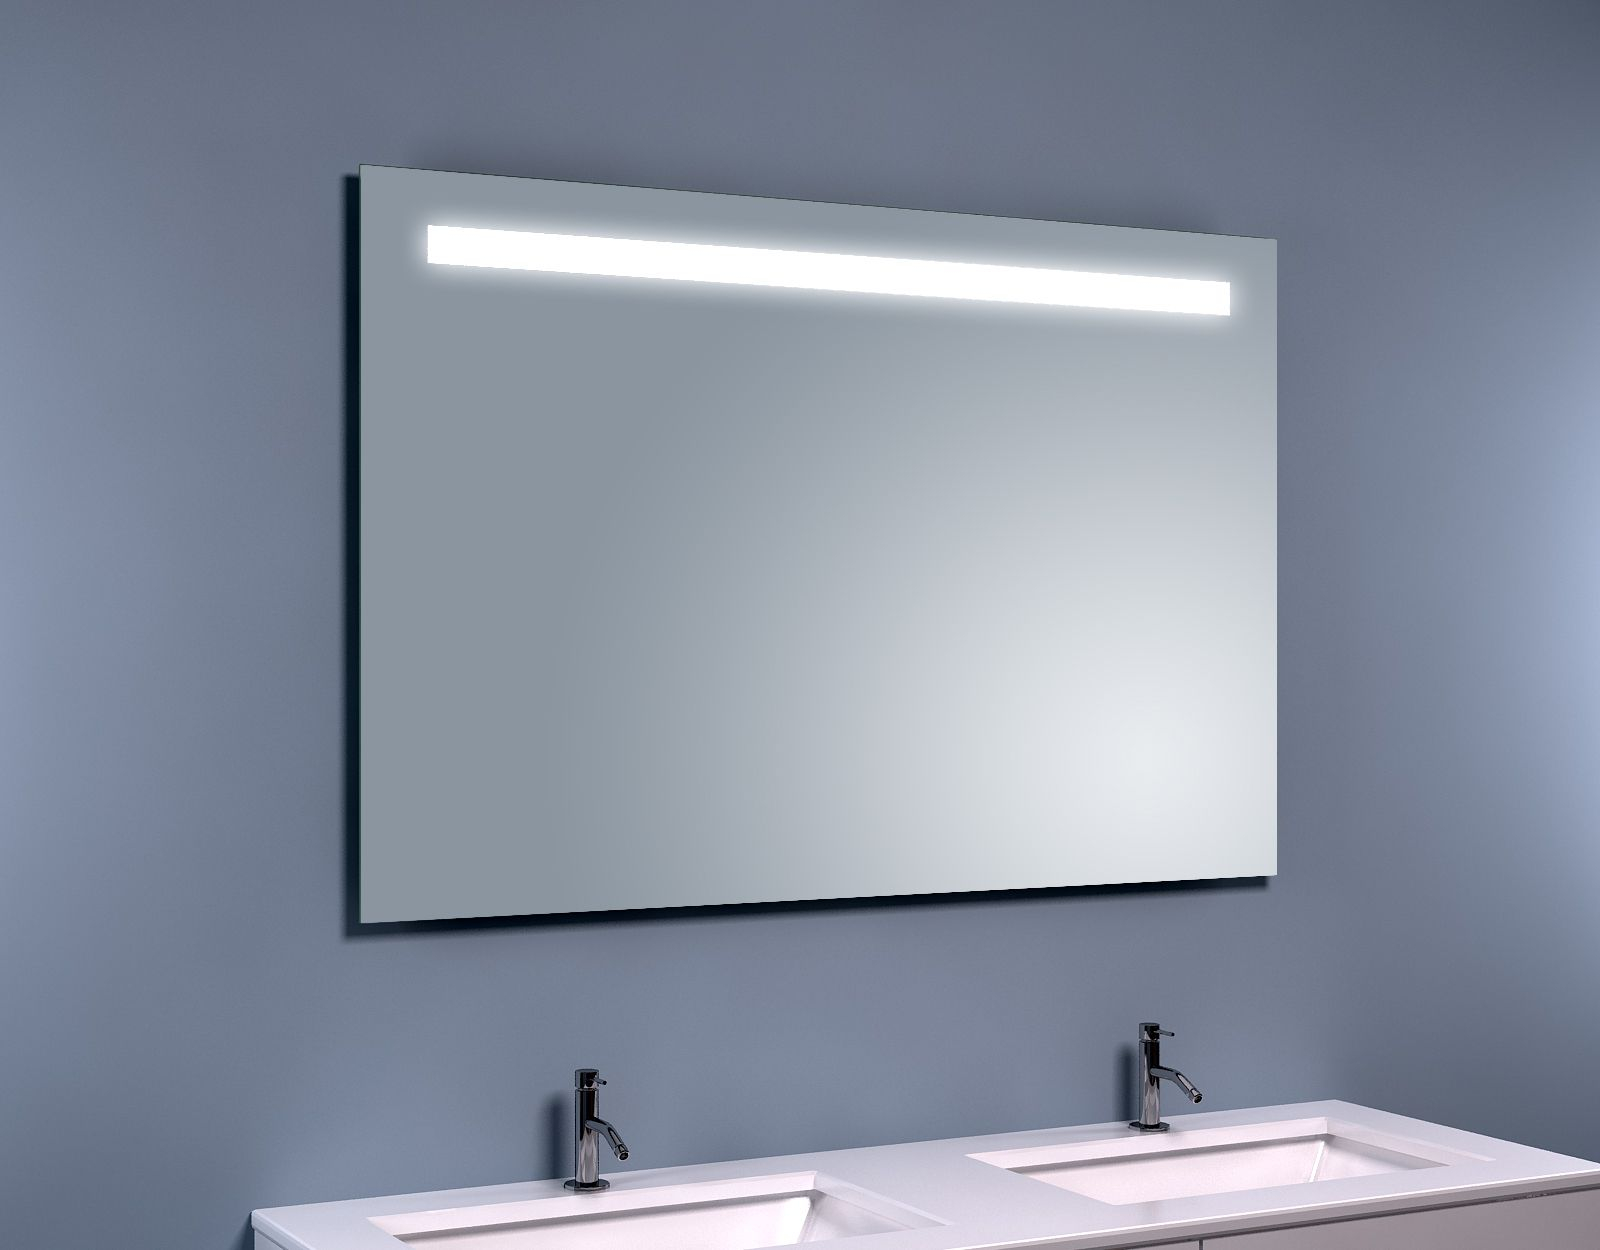 Mueller Shine LED spiegel 120x80cm